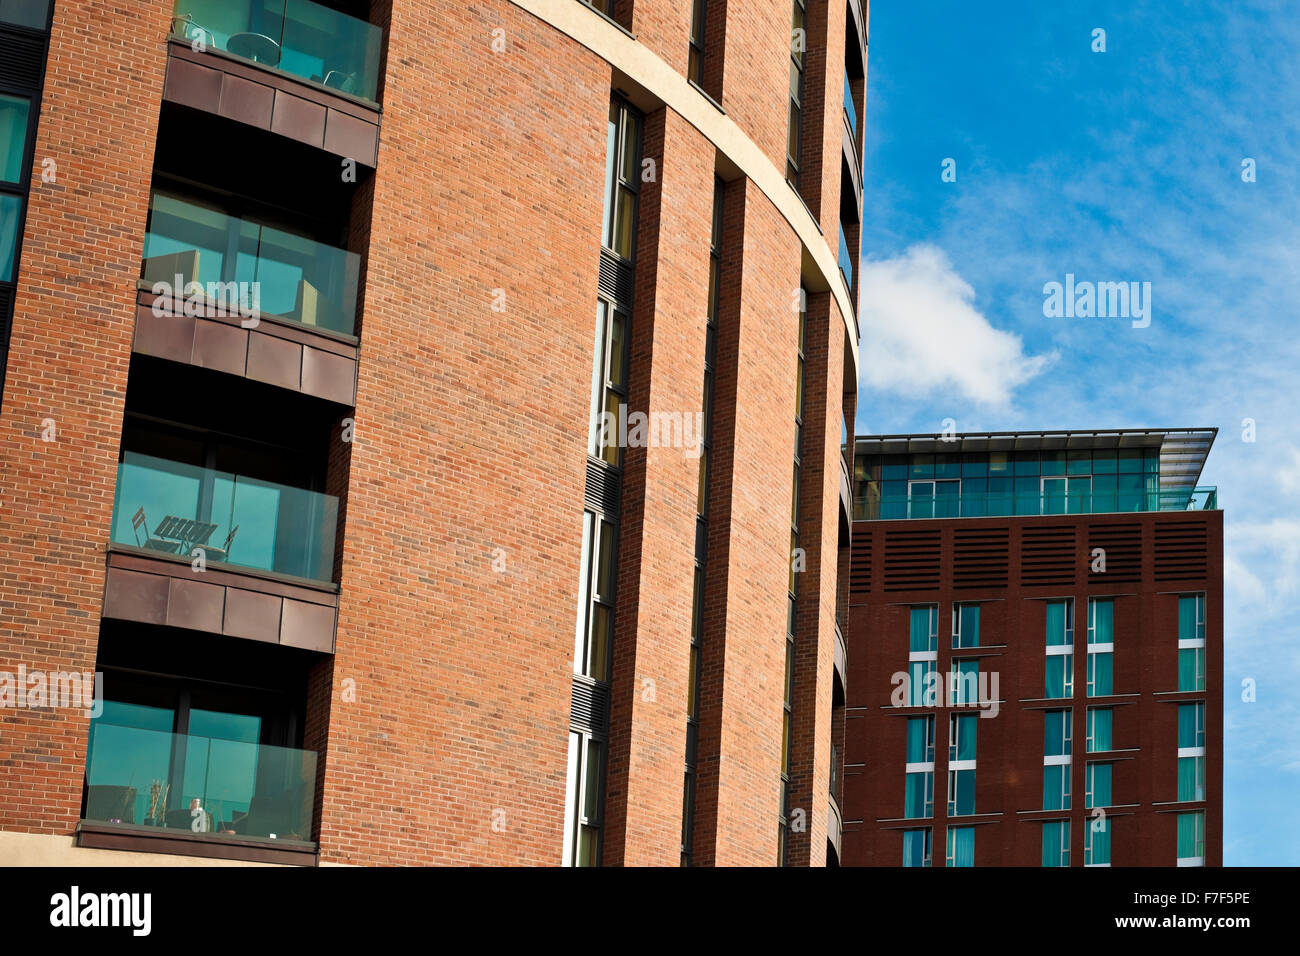 Modern city centre apartments Leeds West Yorkshire England UK United Kingdom GB Great Britain - Stock Image